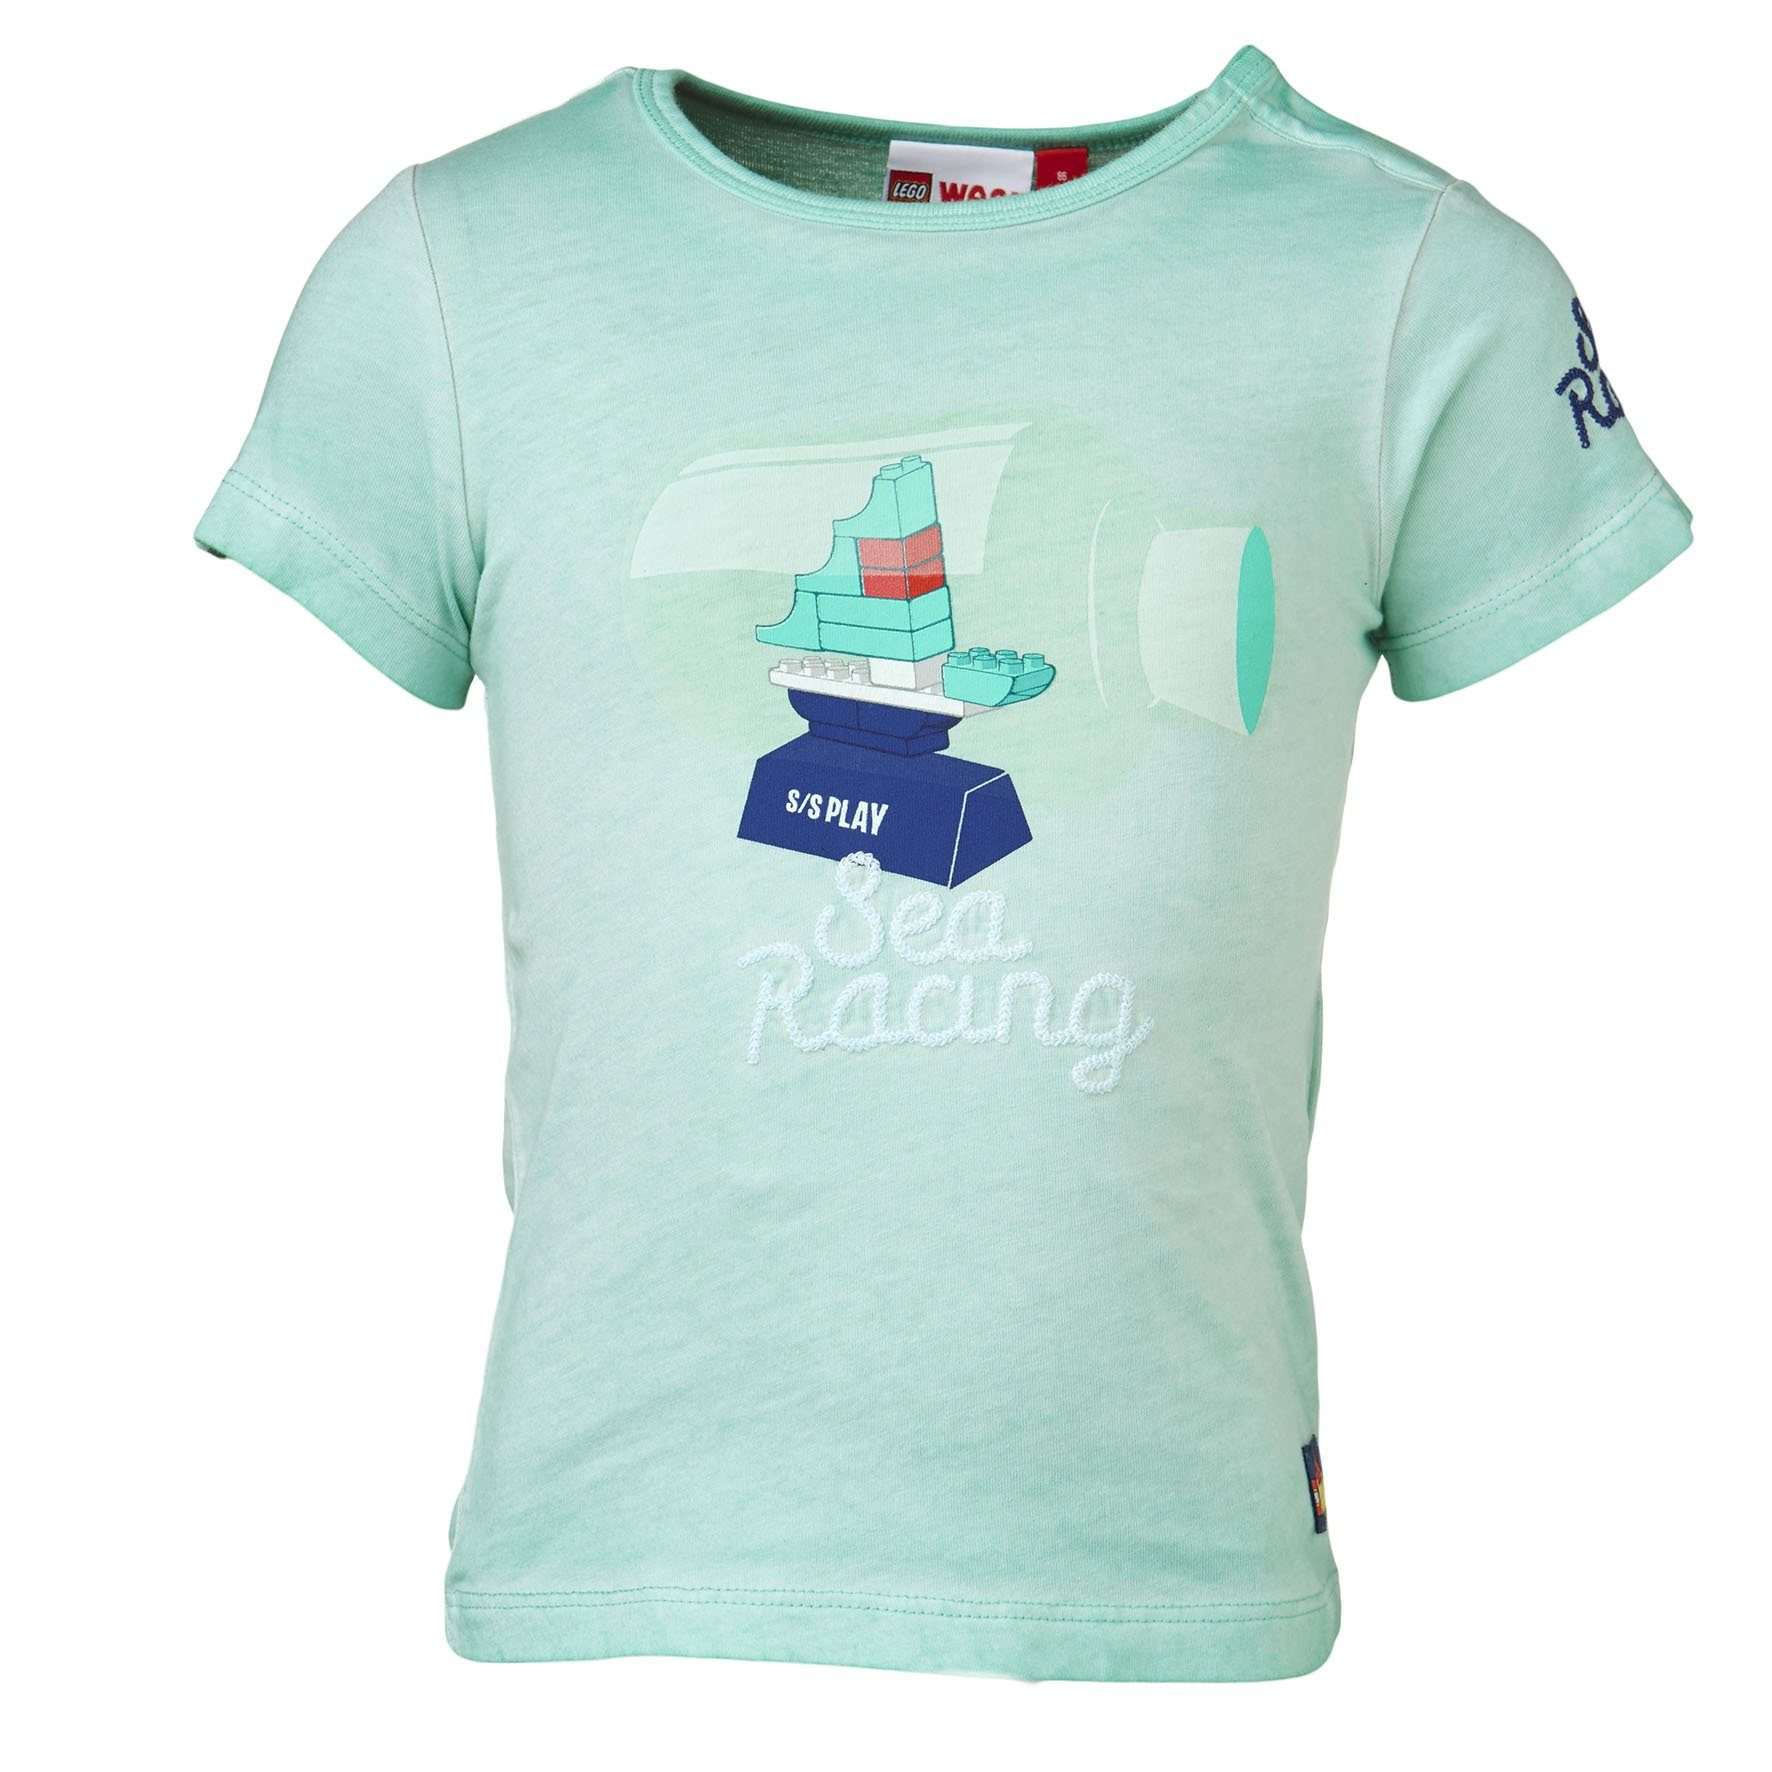 "LEGO Wear Duplo T-Shirt ""Sea Racing"" kurzarm Shirt Trey"